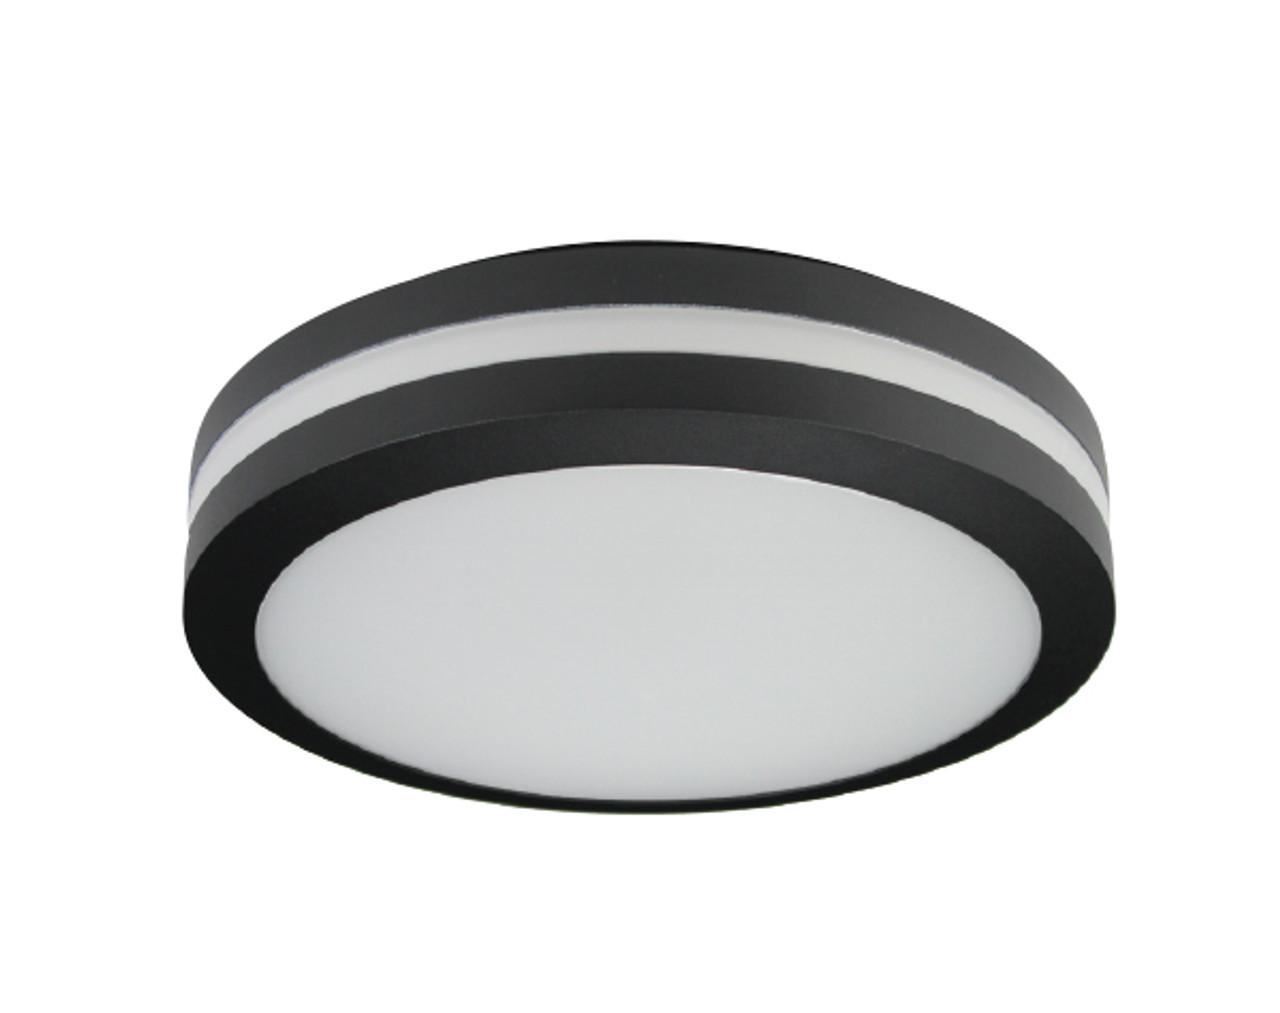 Motion Sensor Led Bulkhead Light Ceiling Or Wall Mount Outdoor Wet Location Ul Listed 14 Watt 1350 Lumens 3000k With Black Finish Superior Lighting